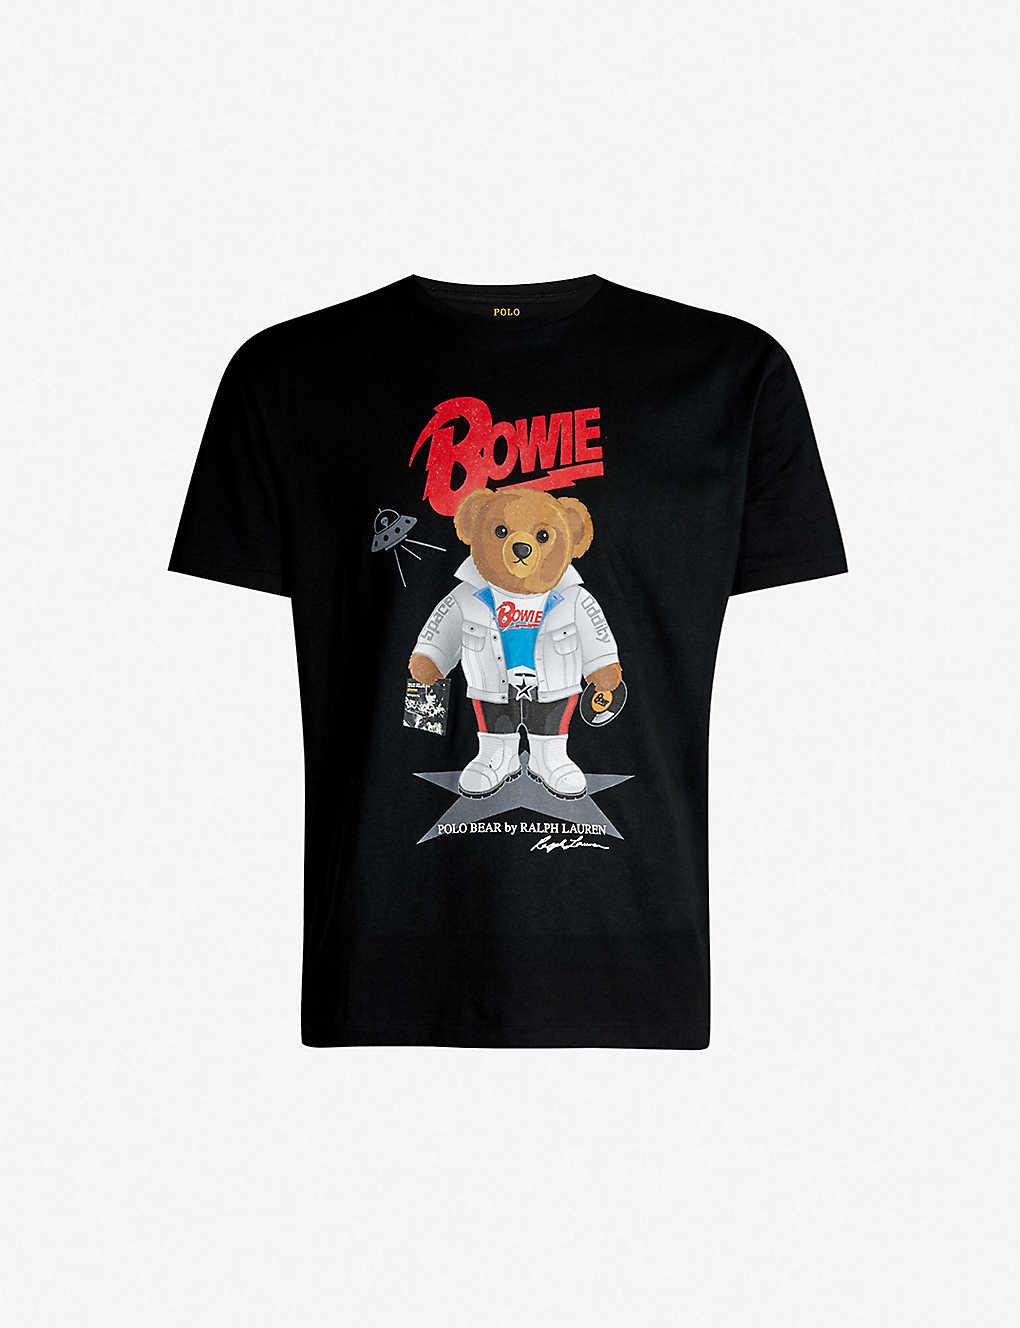 42a35e56b Polo Ralph Lauren Bowie Teddy Bear Print Classic Fit Cotton